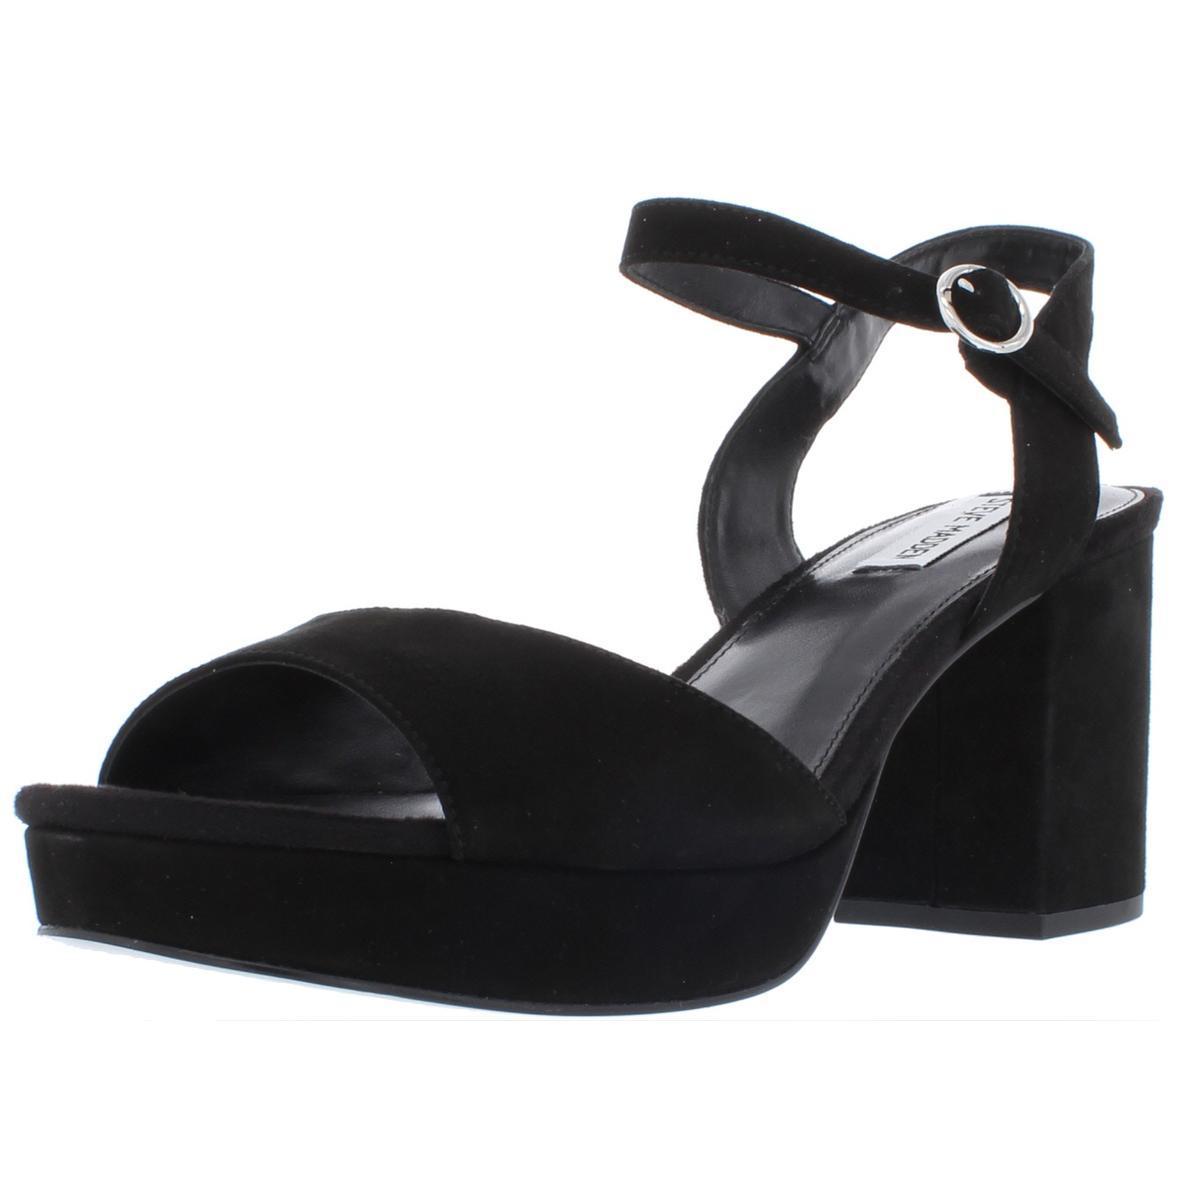 acf0779c7388d Details about Steve Madden Womens Spinner Solid Block Heel Dress Sandals  Shoes BHFO 1805